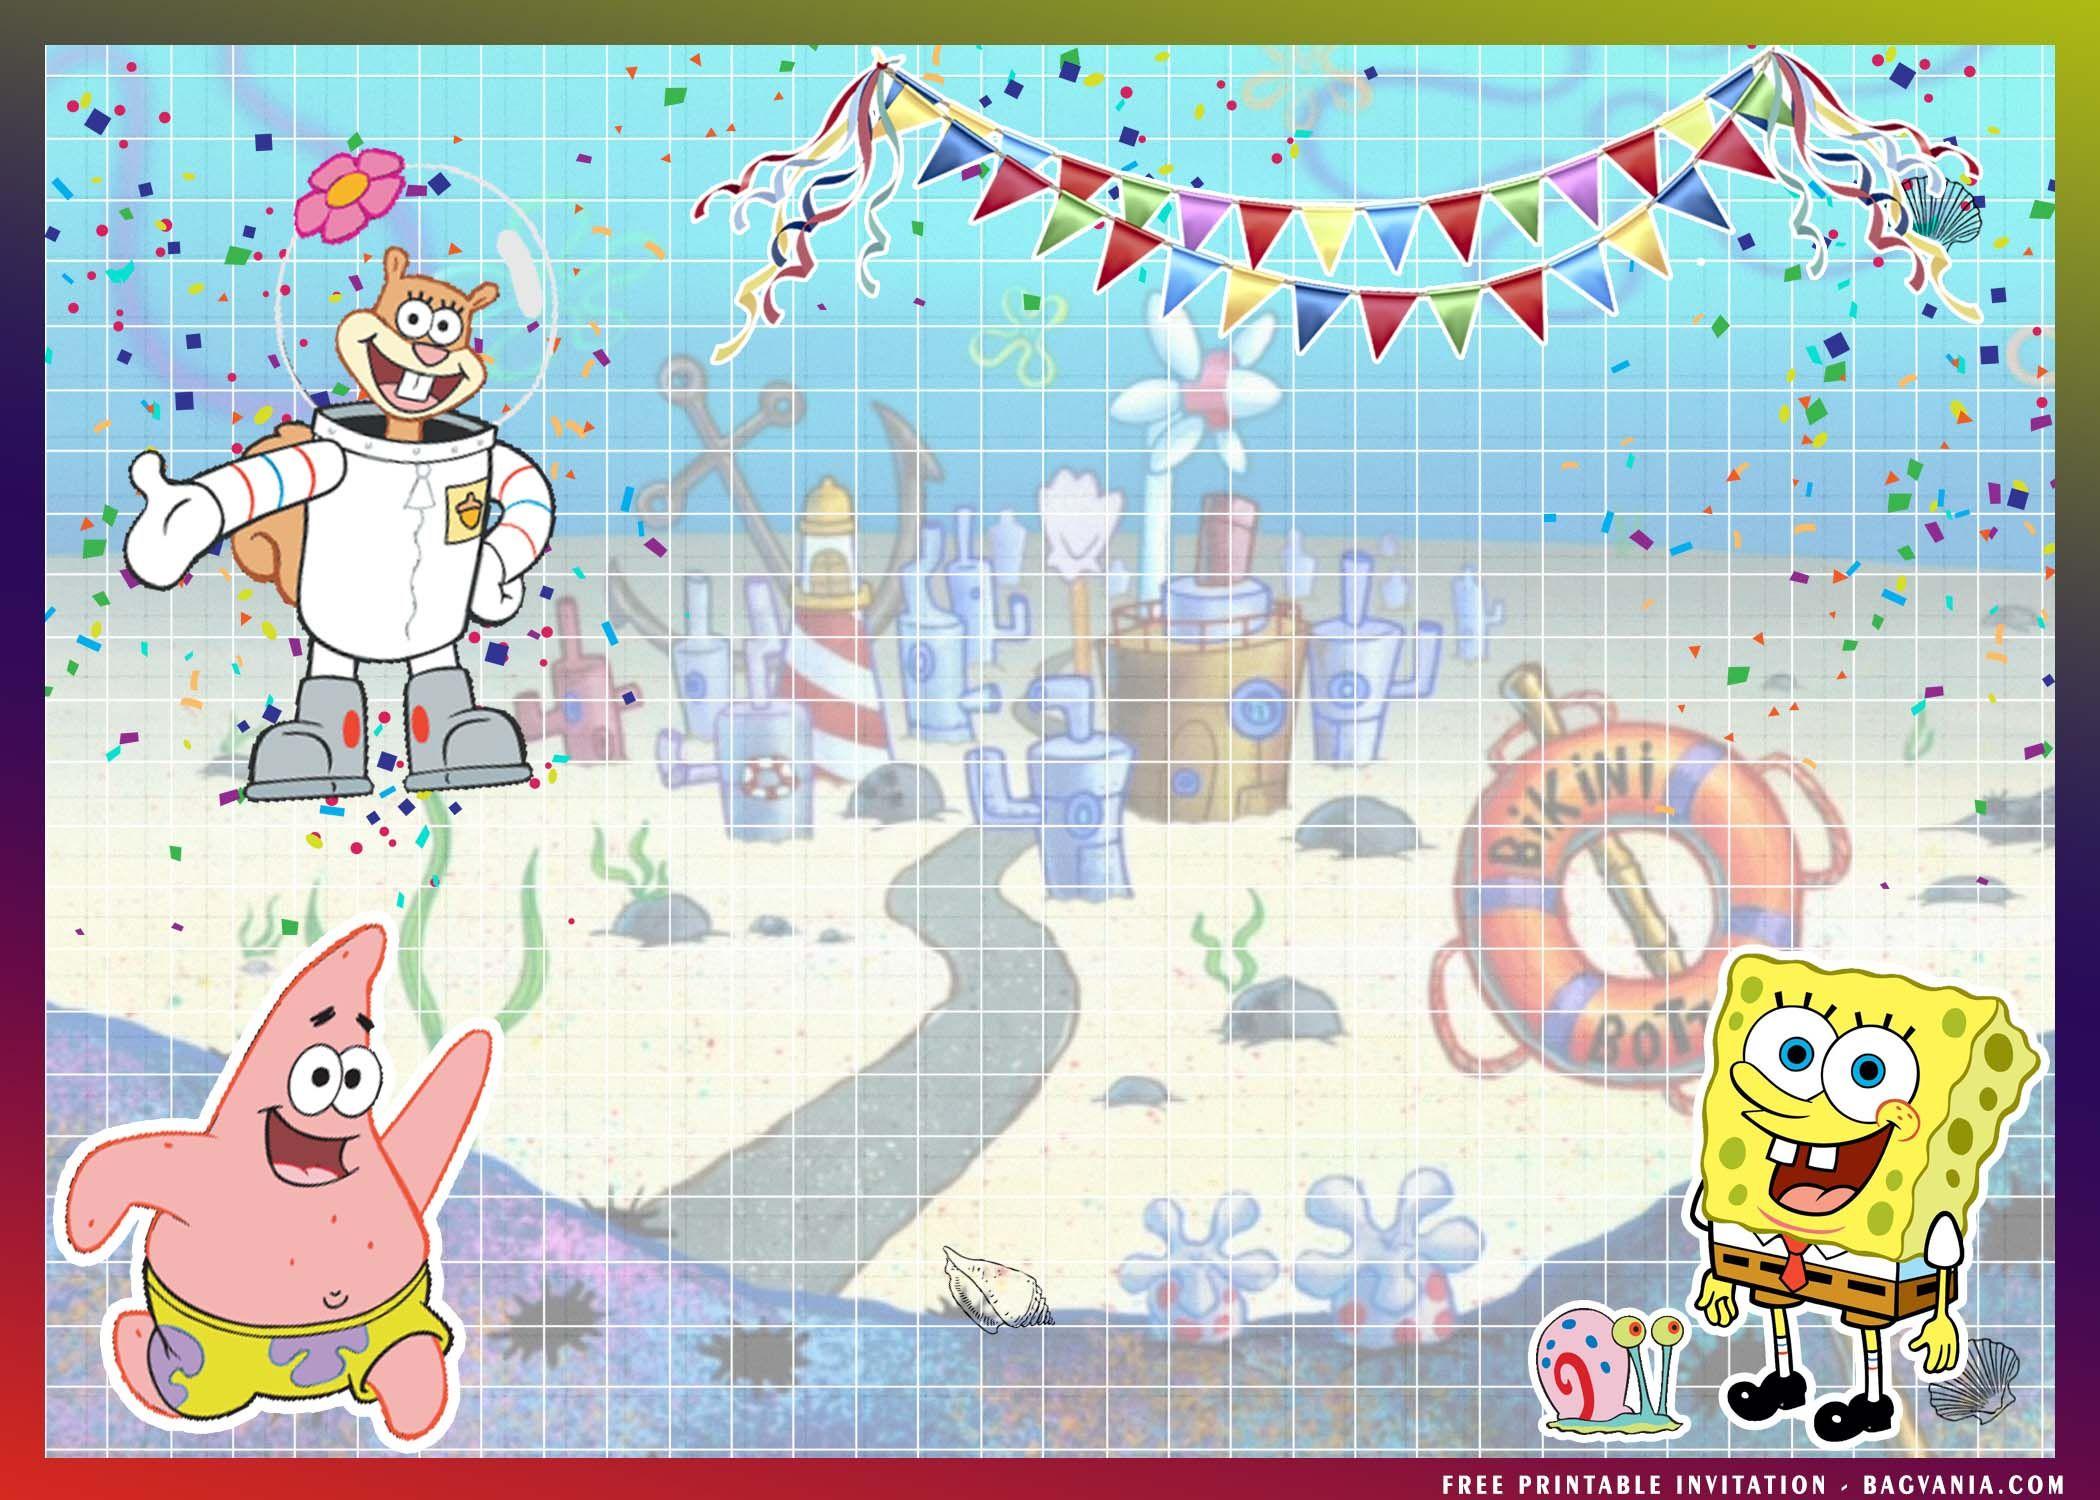 (FREE Printable) - Spongebob Squarepants Birthday Invitat ...